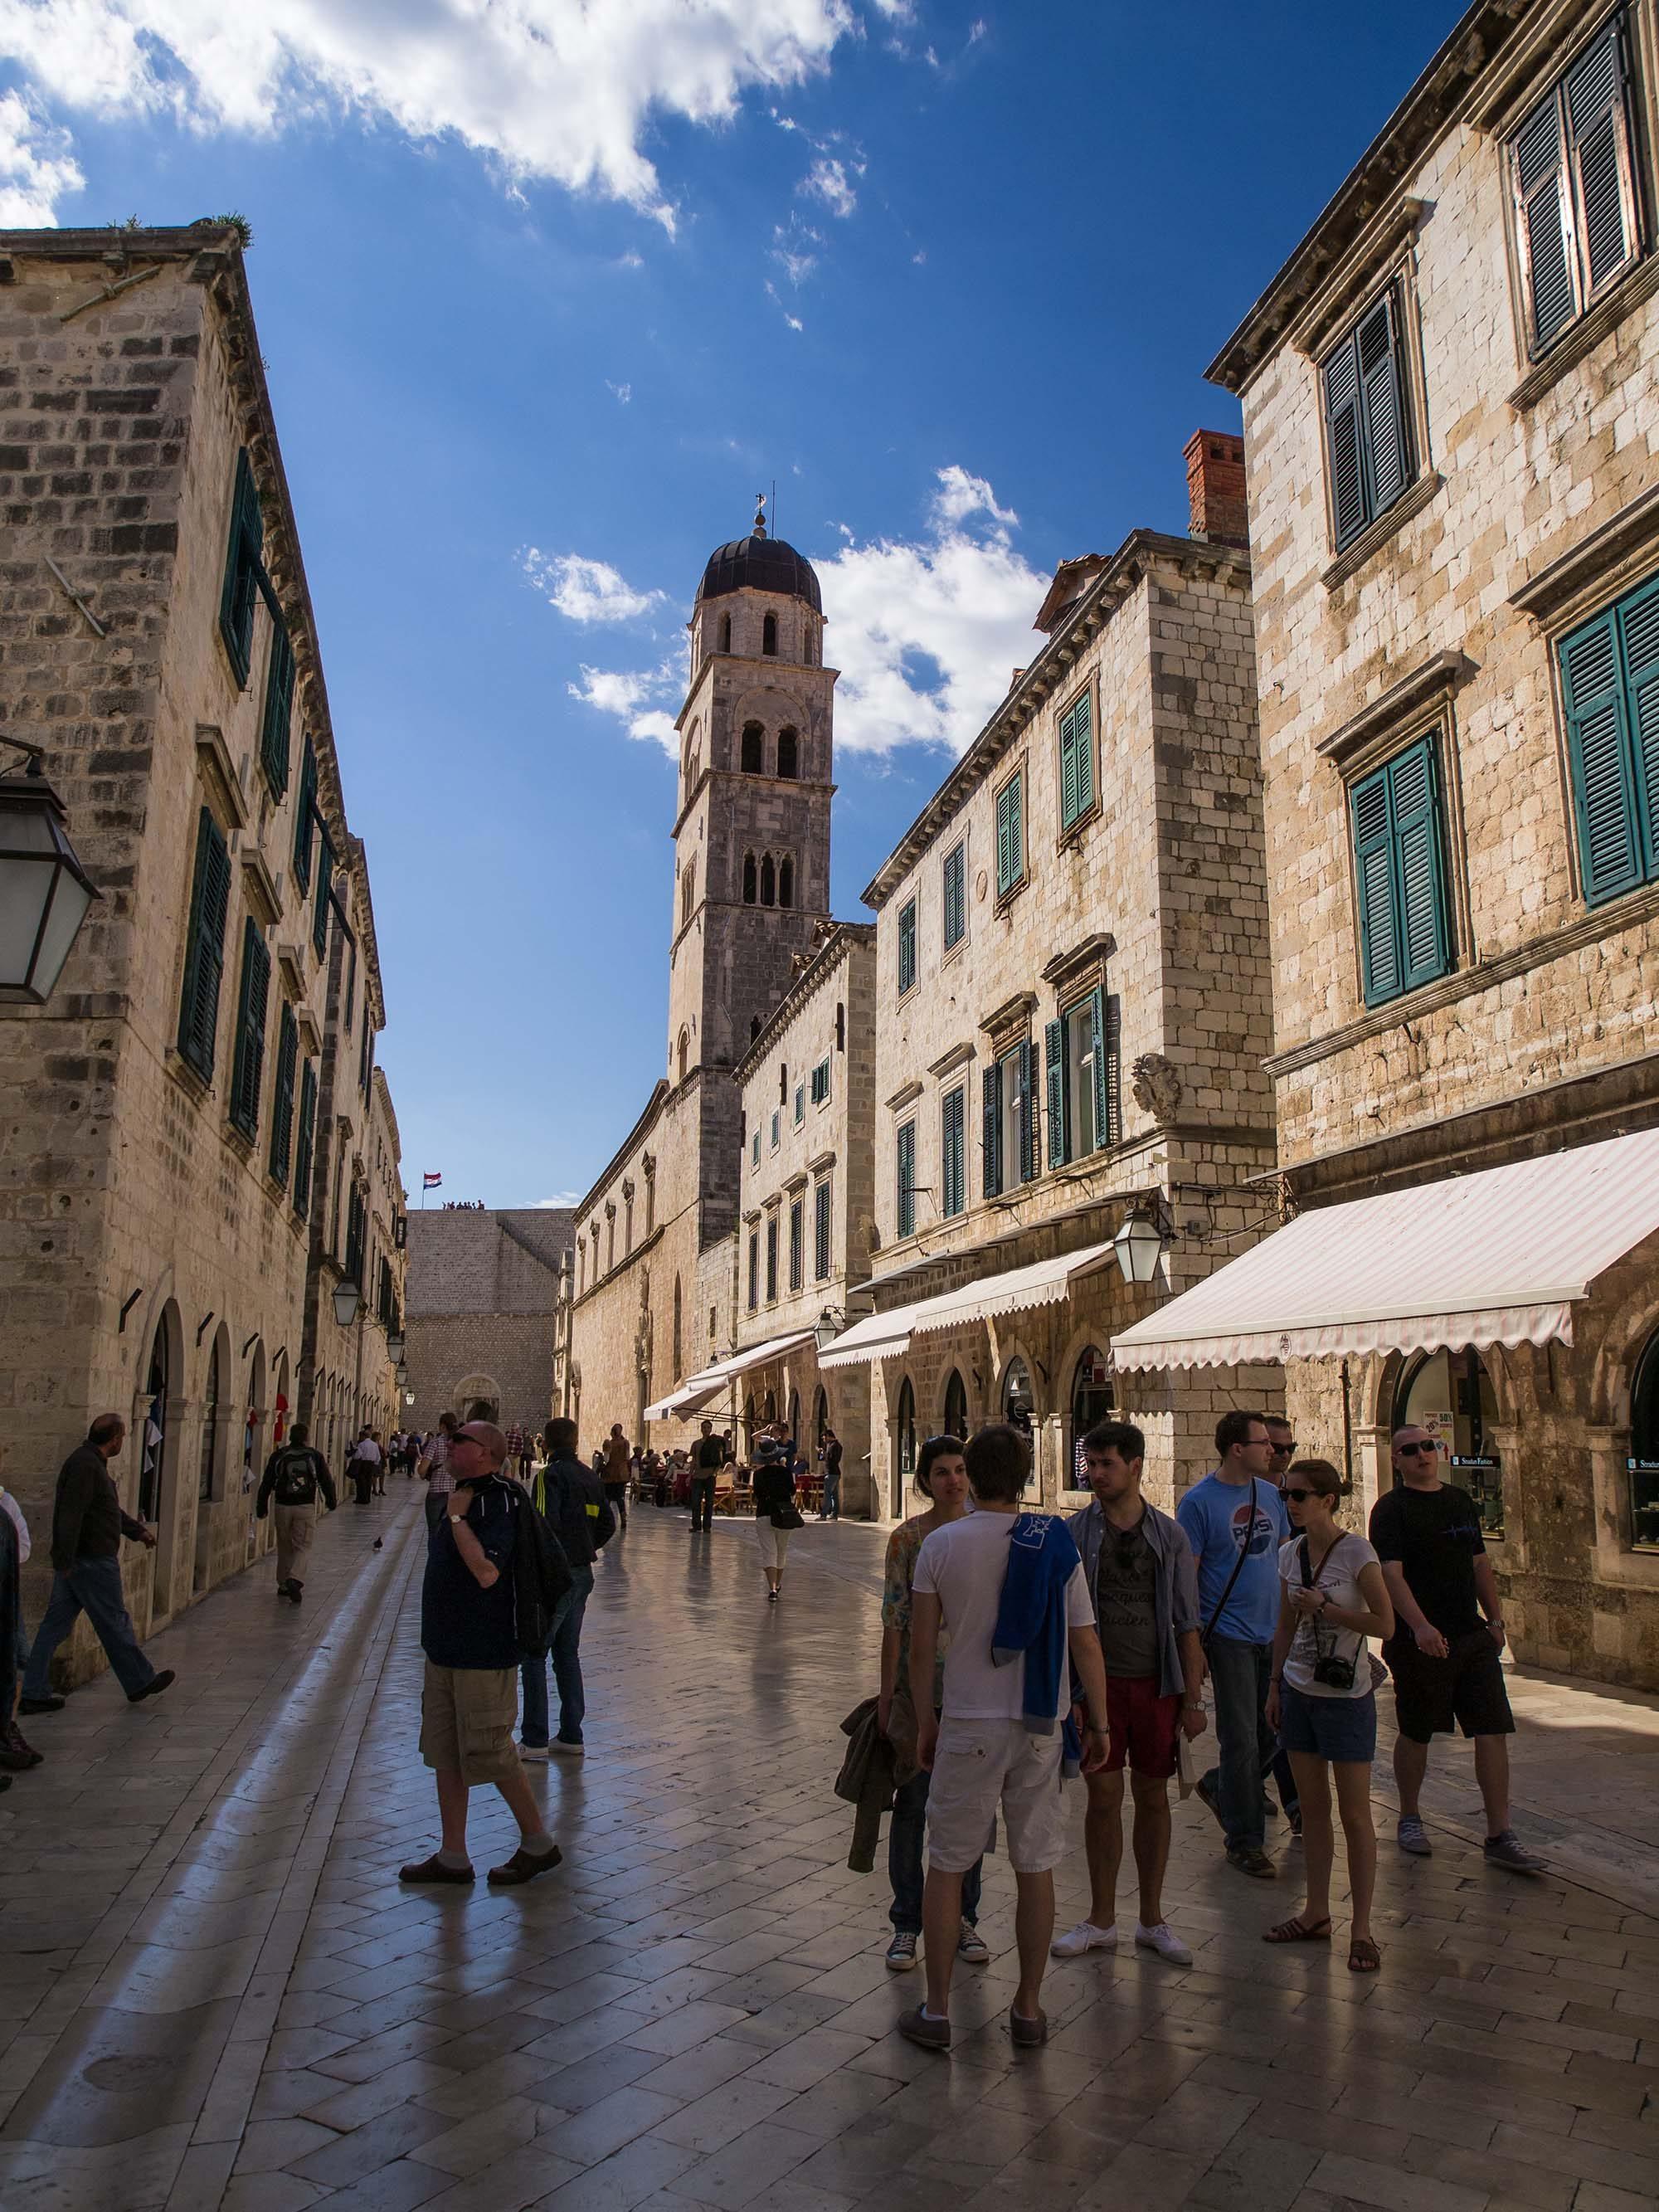 Splendid Croatia 2020 Dubrovnik Split Cruise Croatia